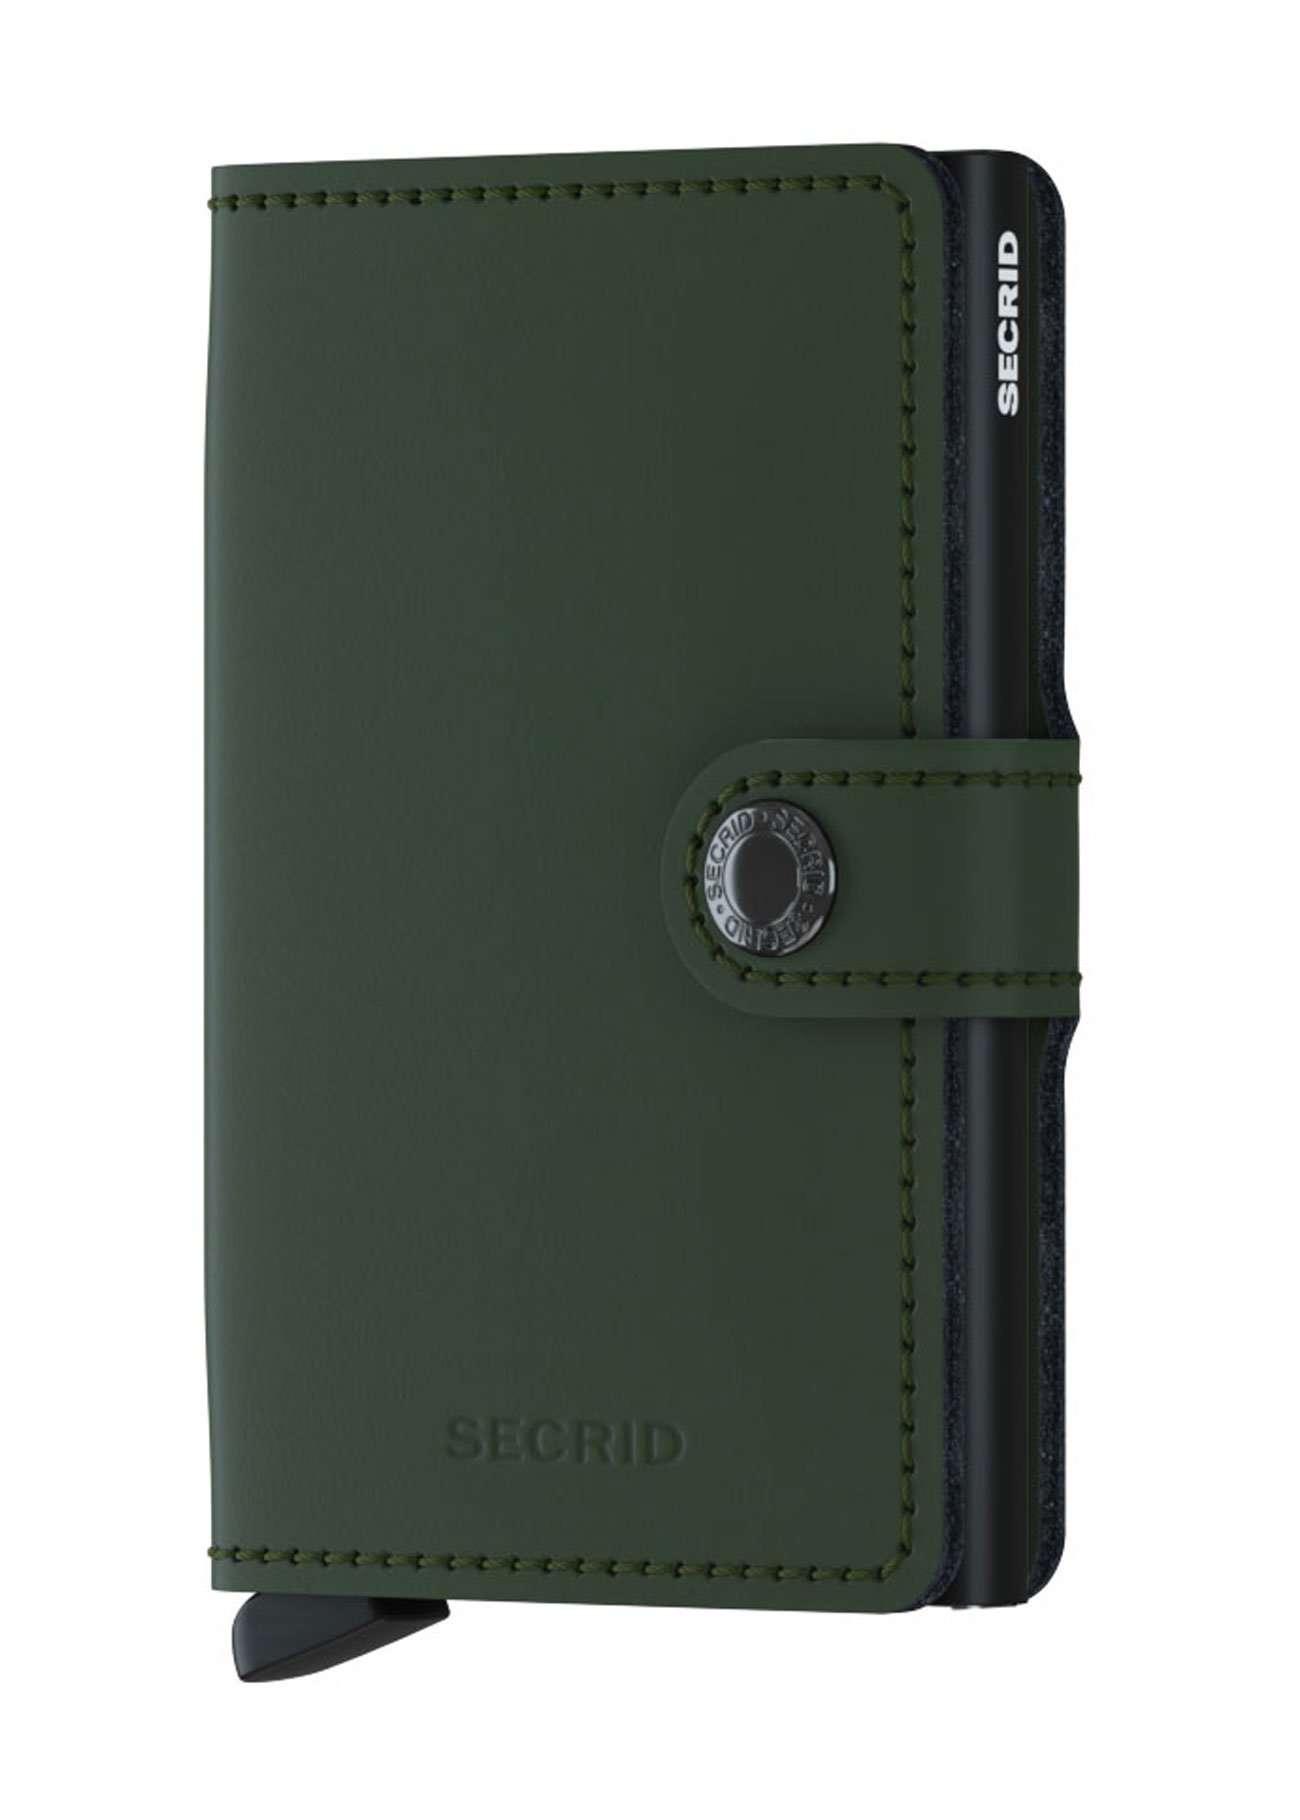 Secrid Wallet Mini Wallet Matte